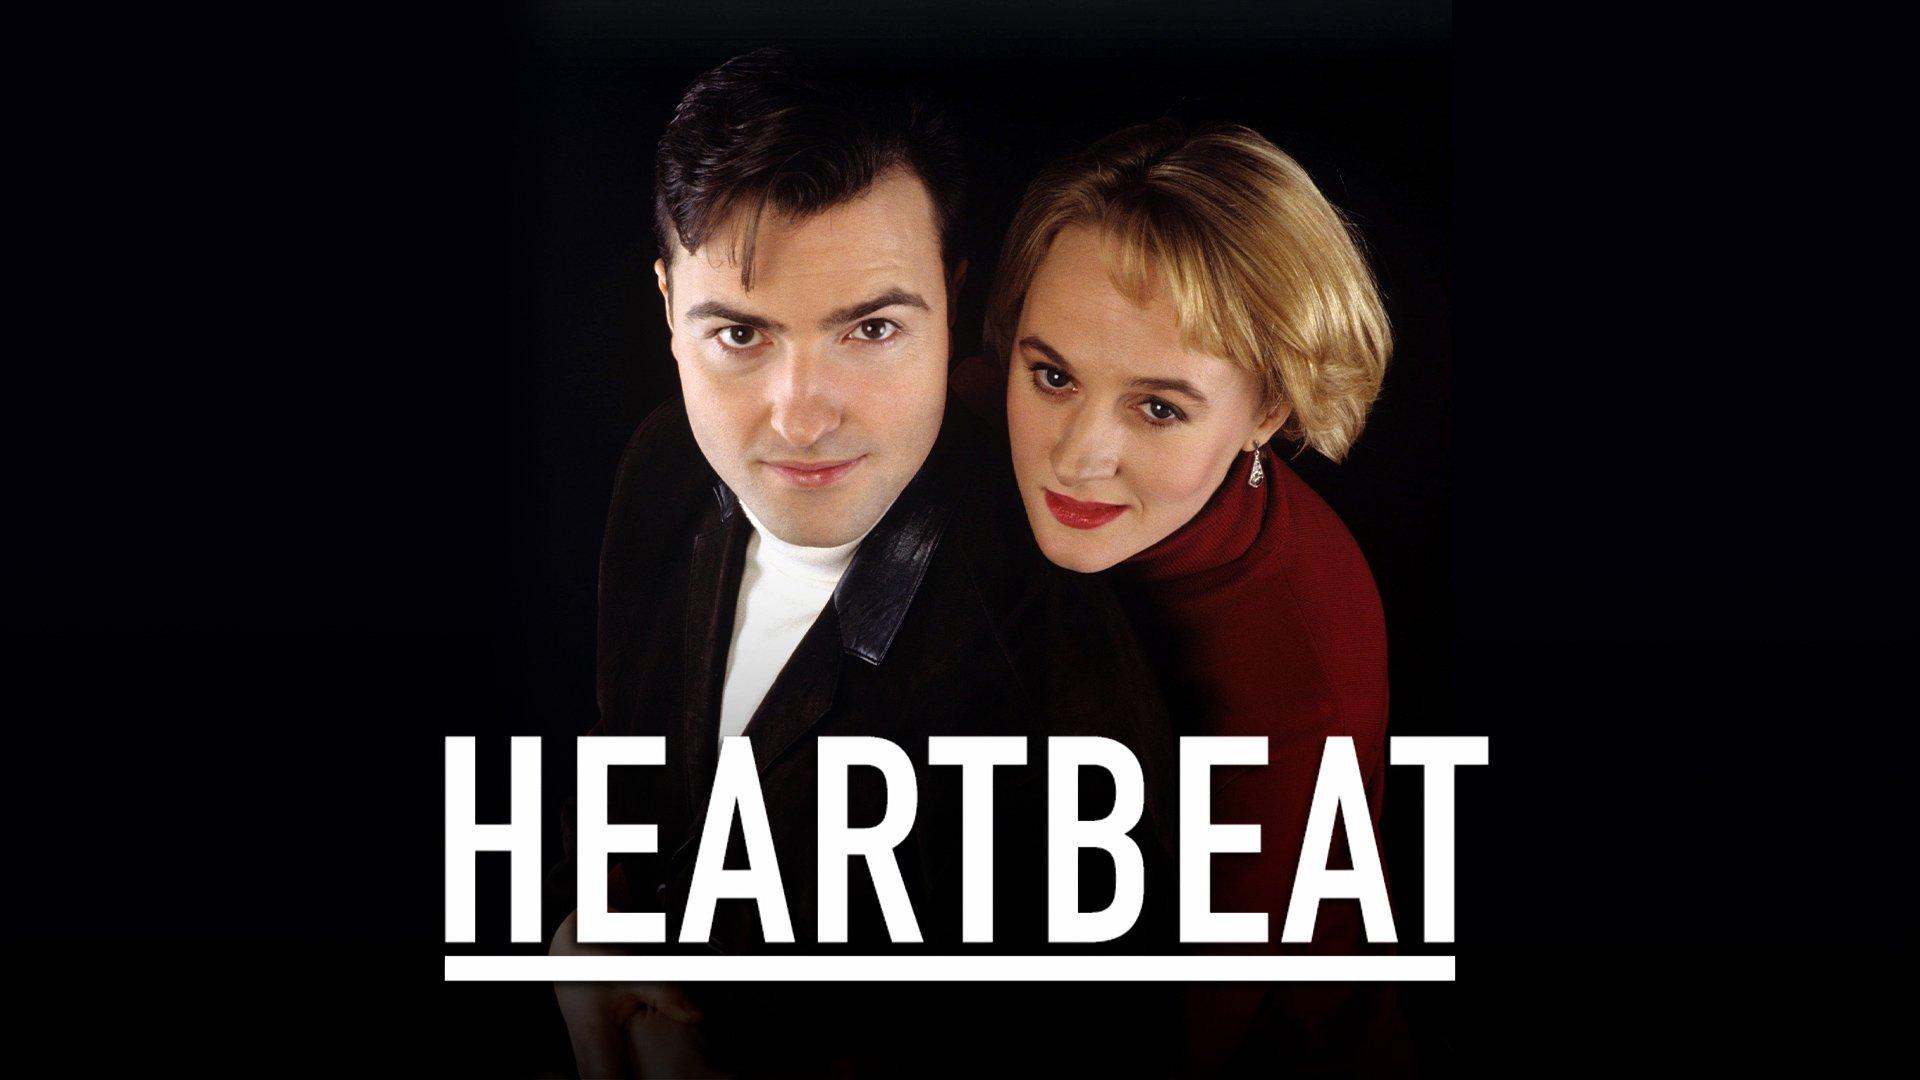 Heartbeat on BritBox UK